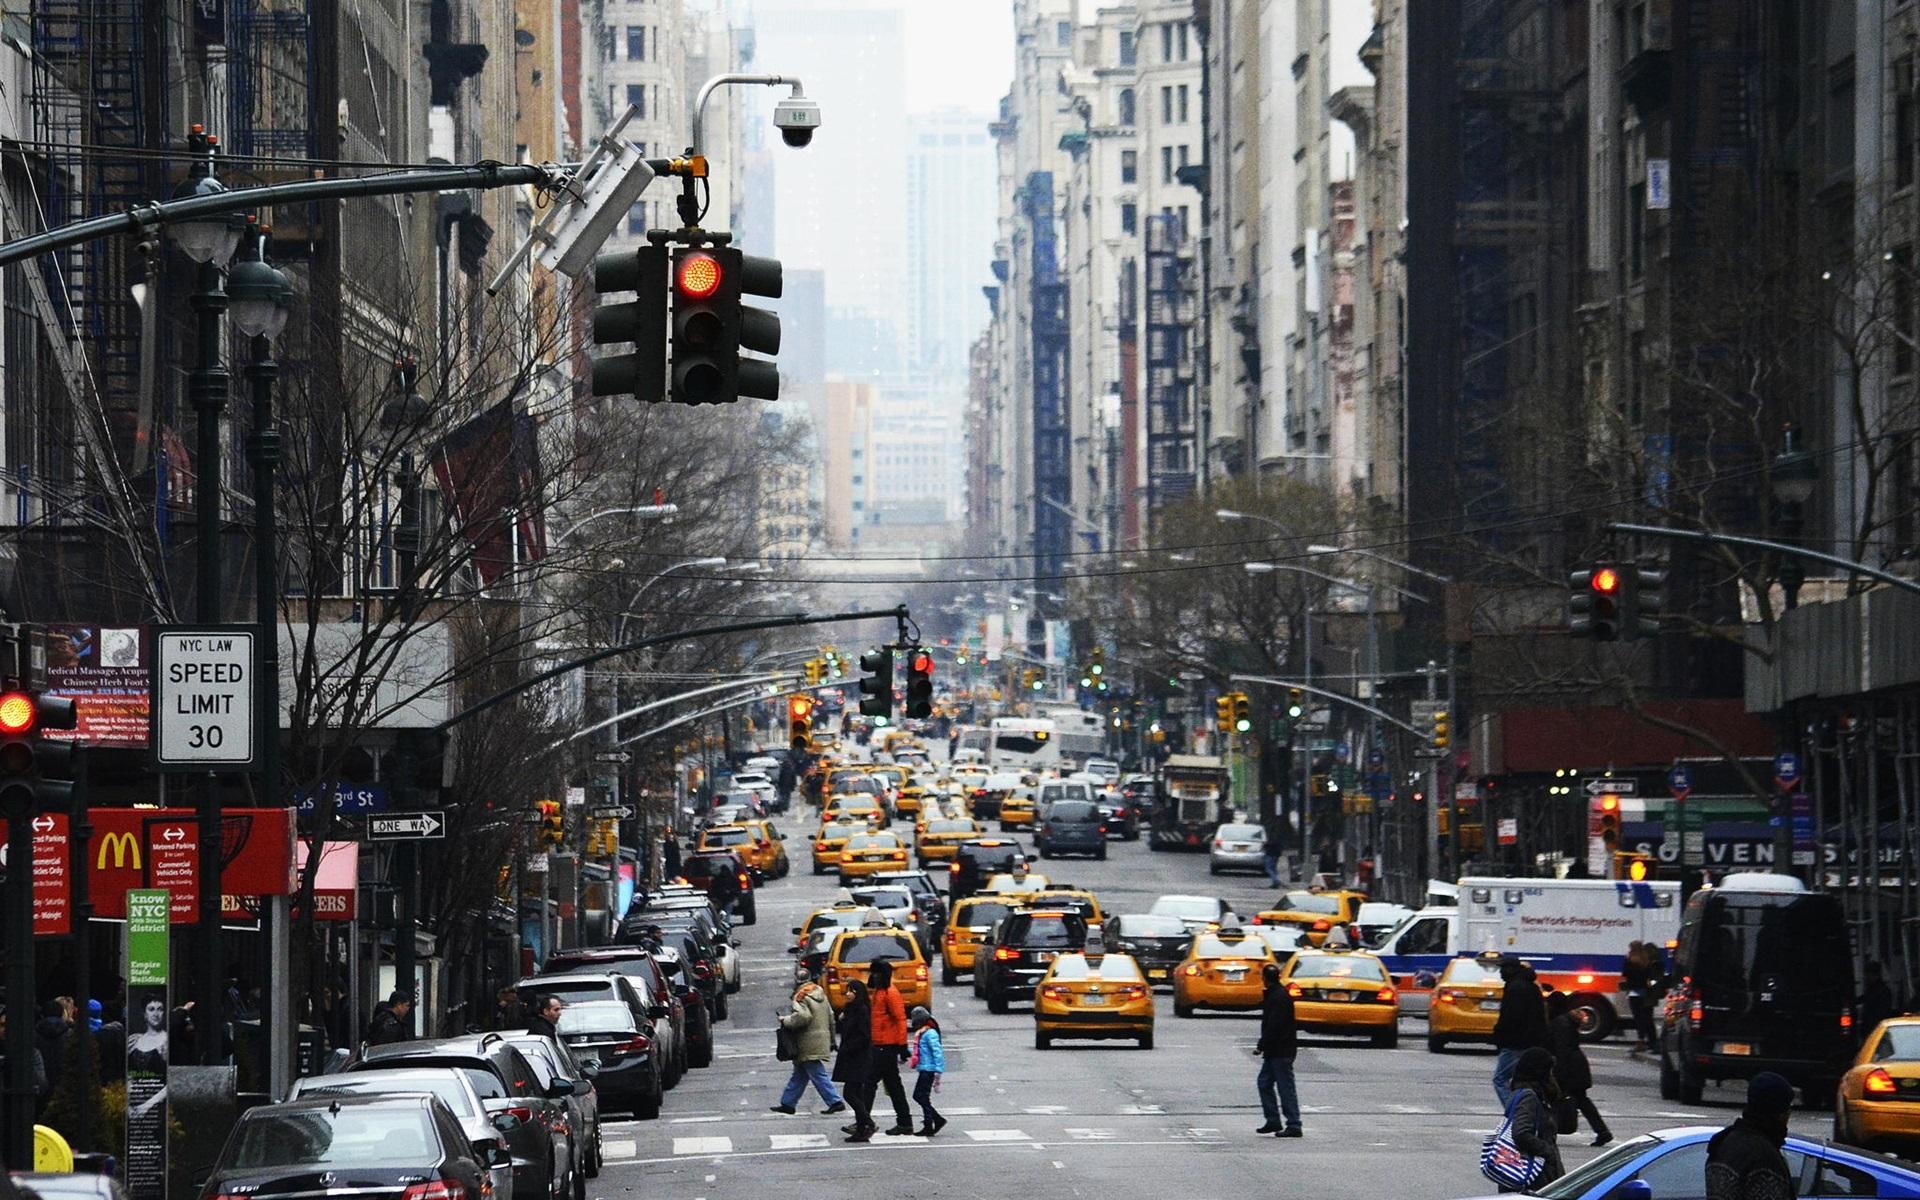 New-York-City-USA-traffic-skyscrapers-street-cars-people_1920x1200